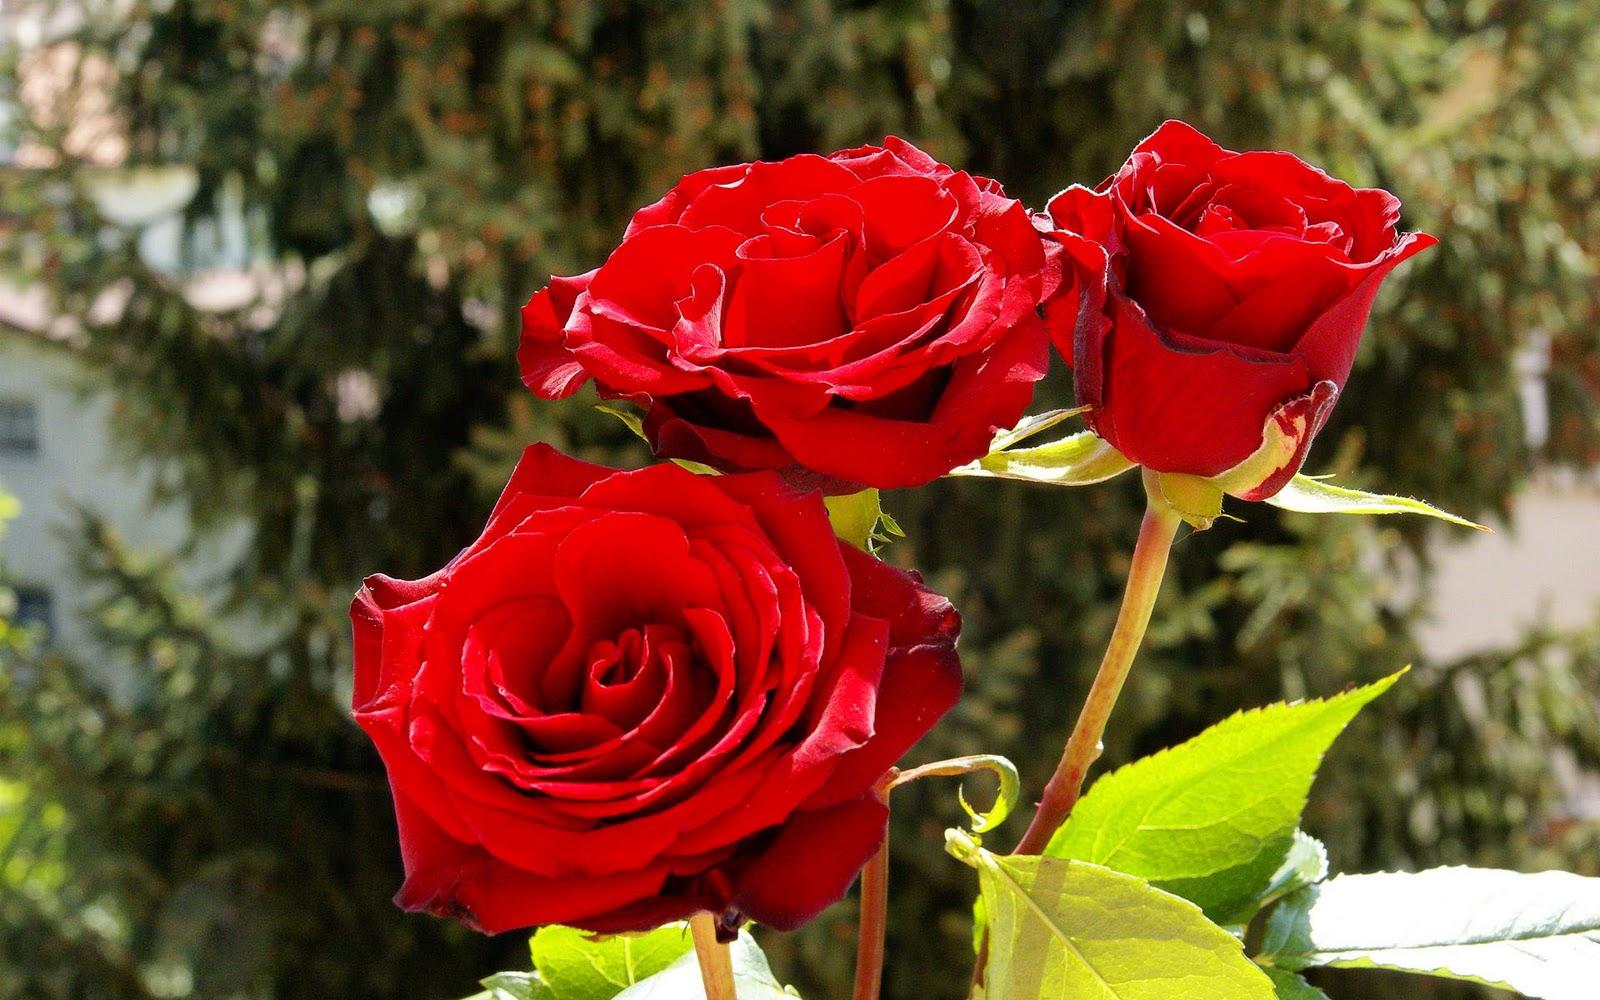 Wallpaper download karne - Wallpaper Download Karne Ke Liye 90 Wedding Red Rose Flower Wallpapers Love Roses Pictures